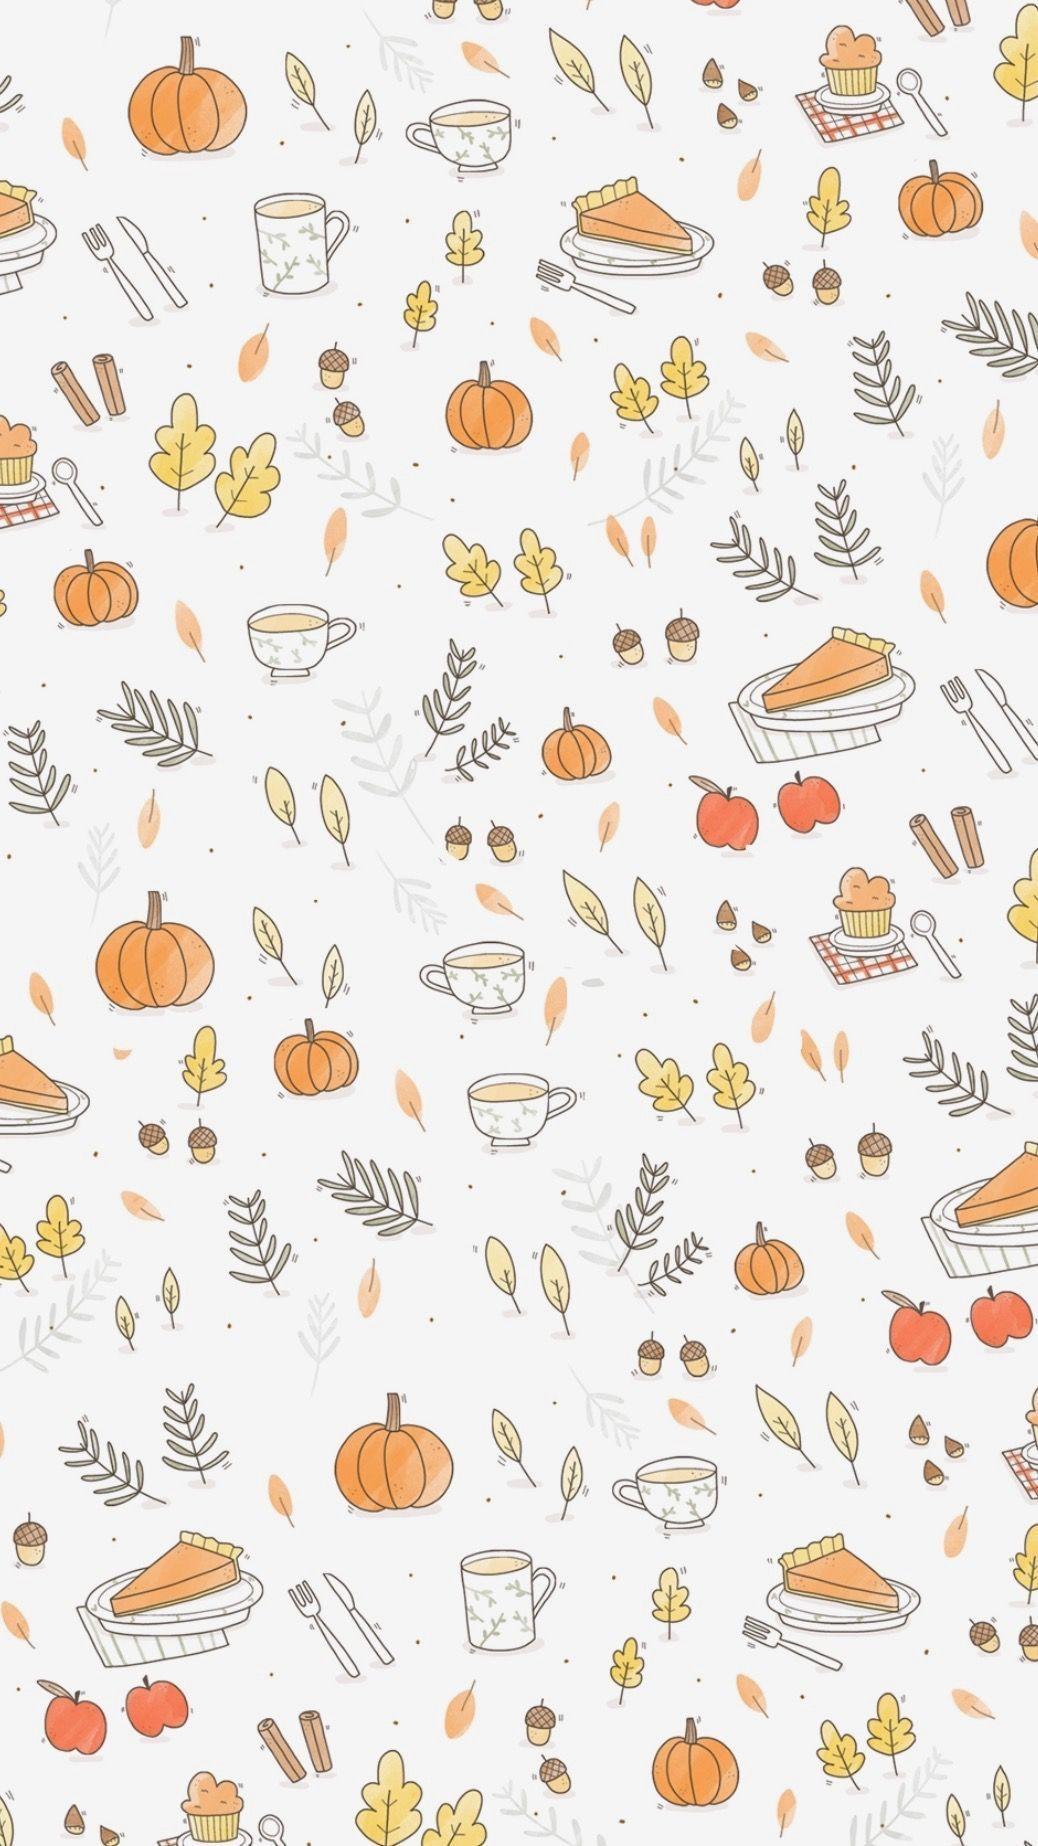 Halloweenbackgroundswallpapers Octoberwallpaperiphone Halloweenbackgroundswallpapers Cute Fall Wallpaper